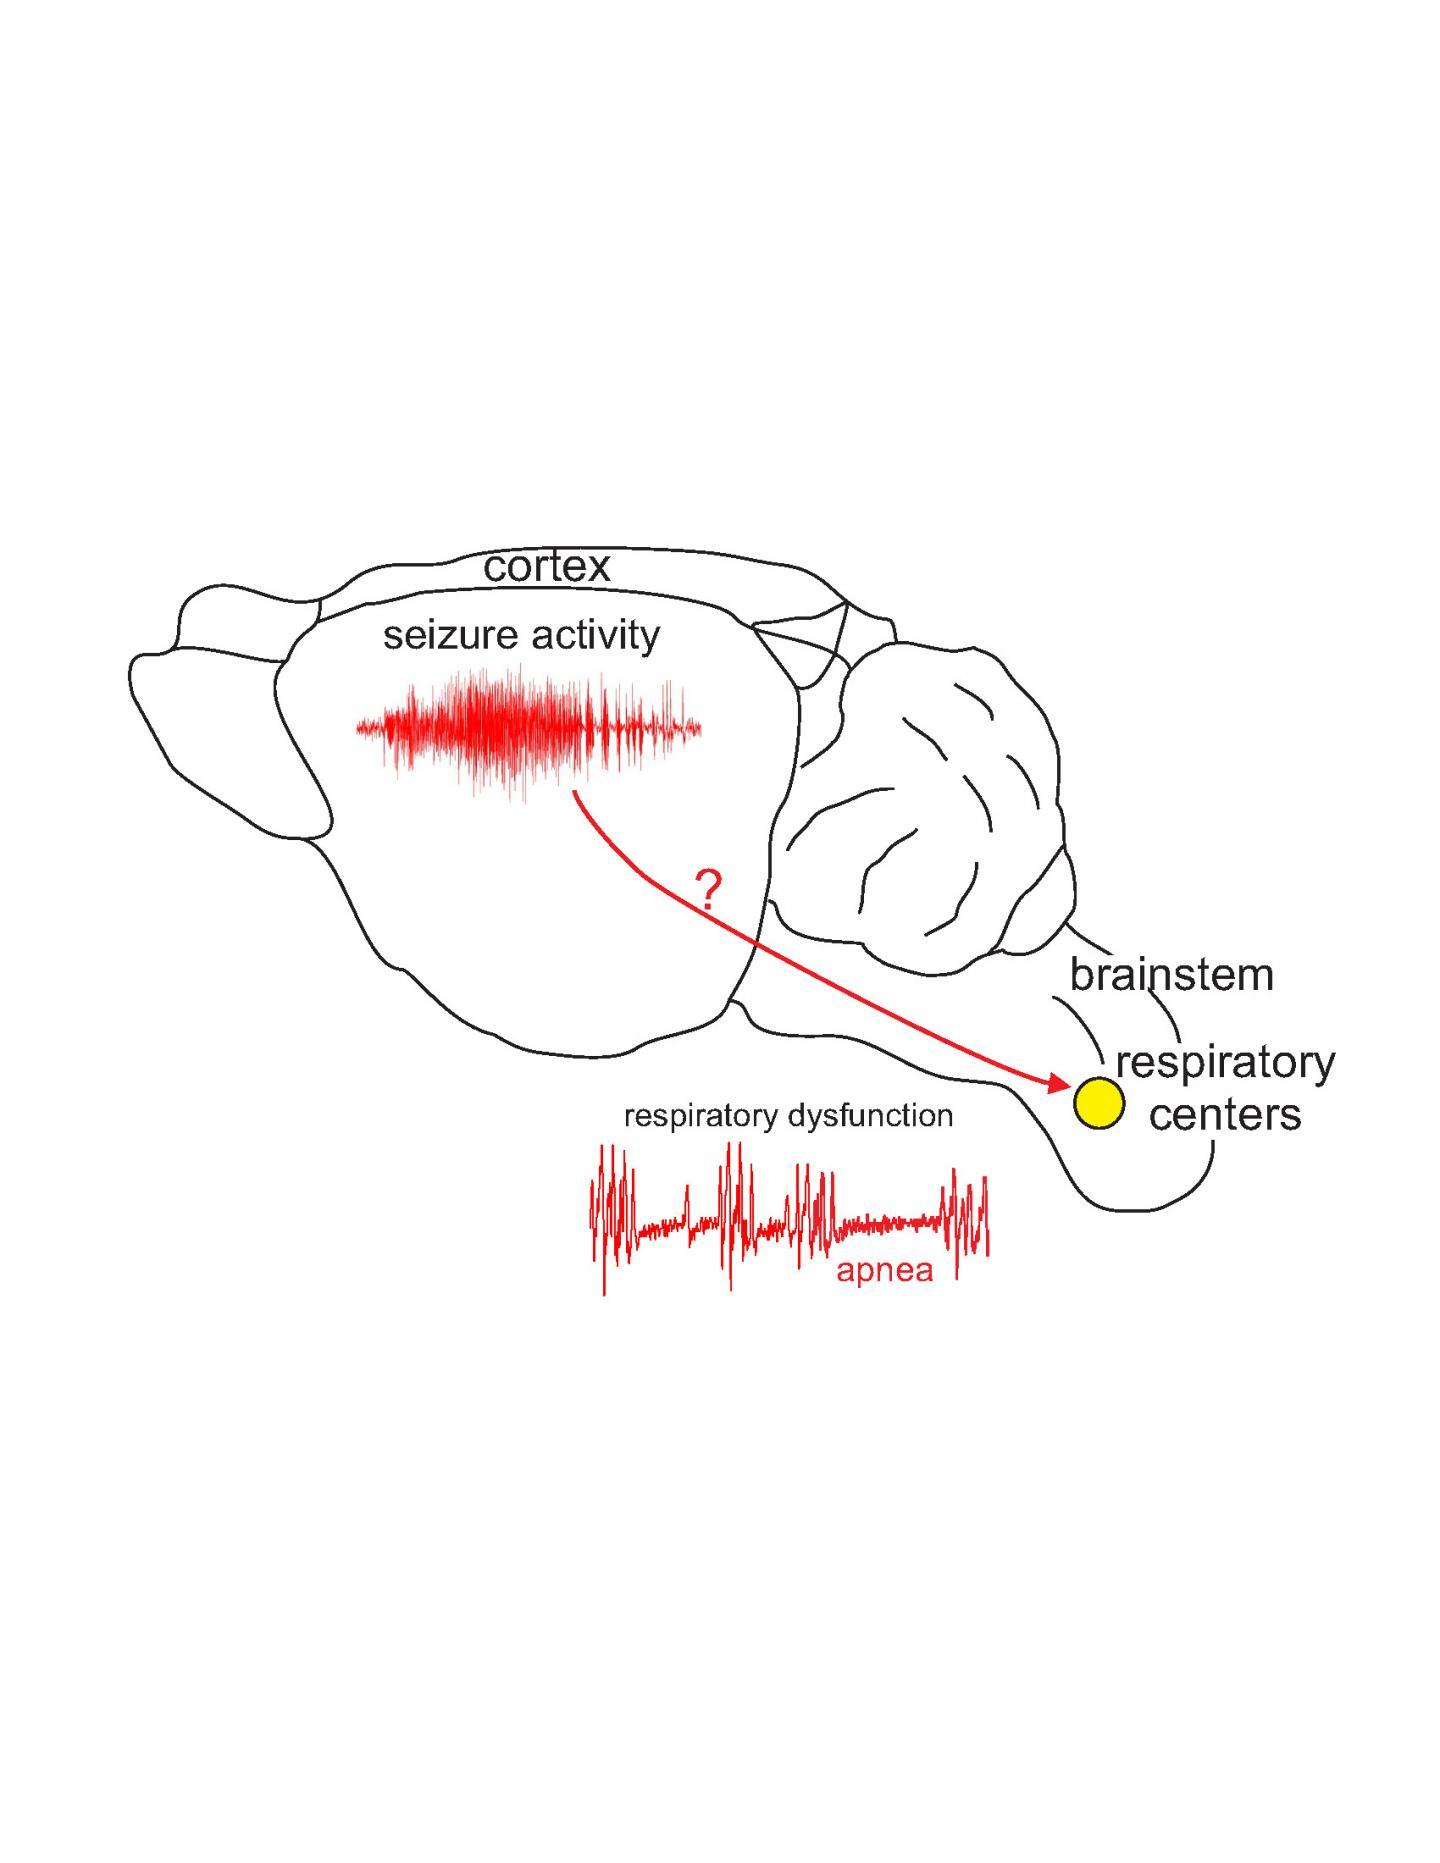 Epilepsy and sudden death linked to bad gene | EurekAlert! Science News